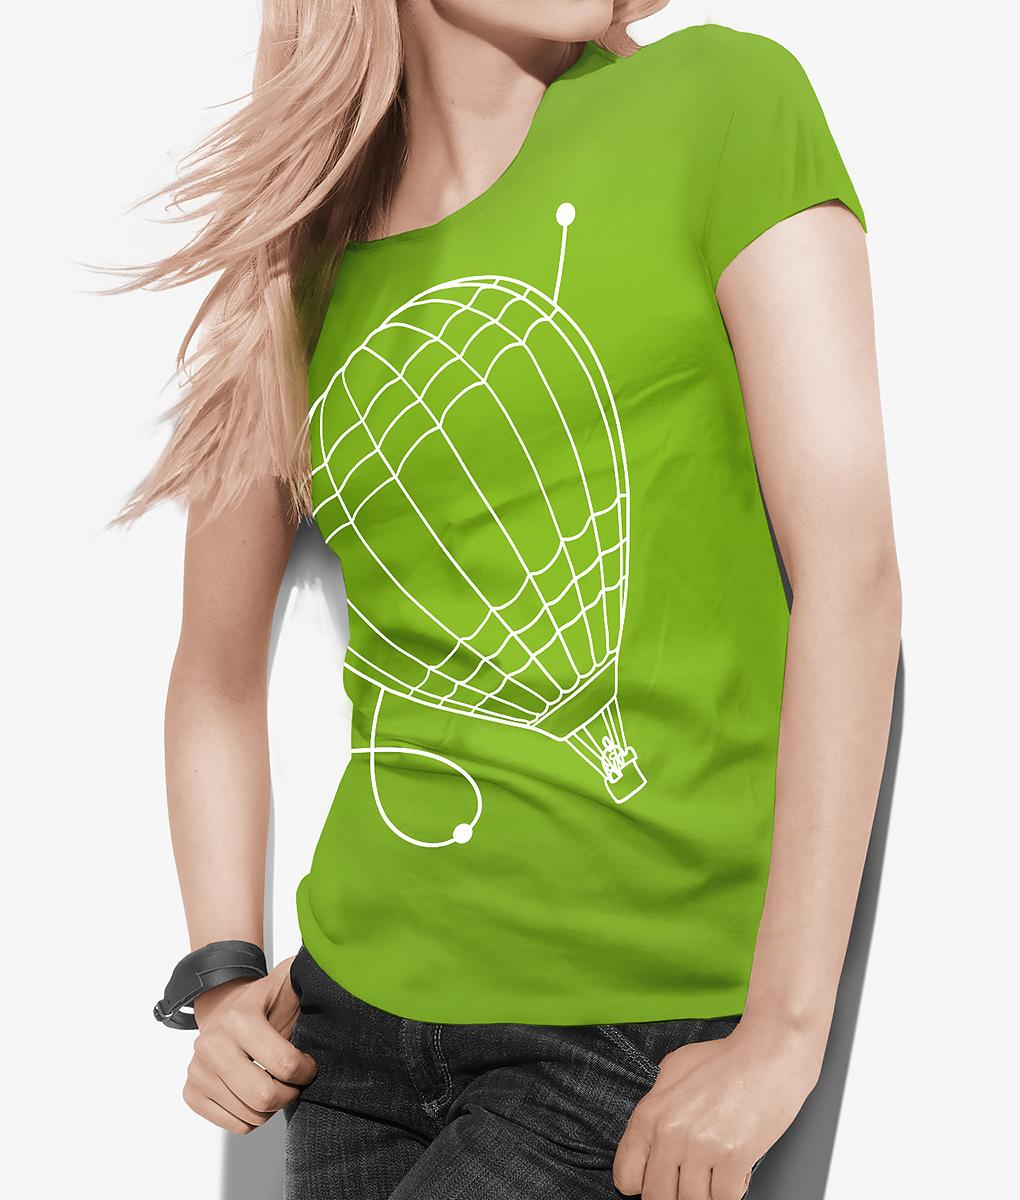 t-shirt_woman_1